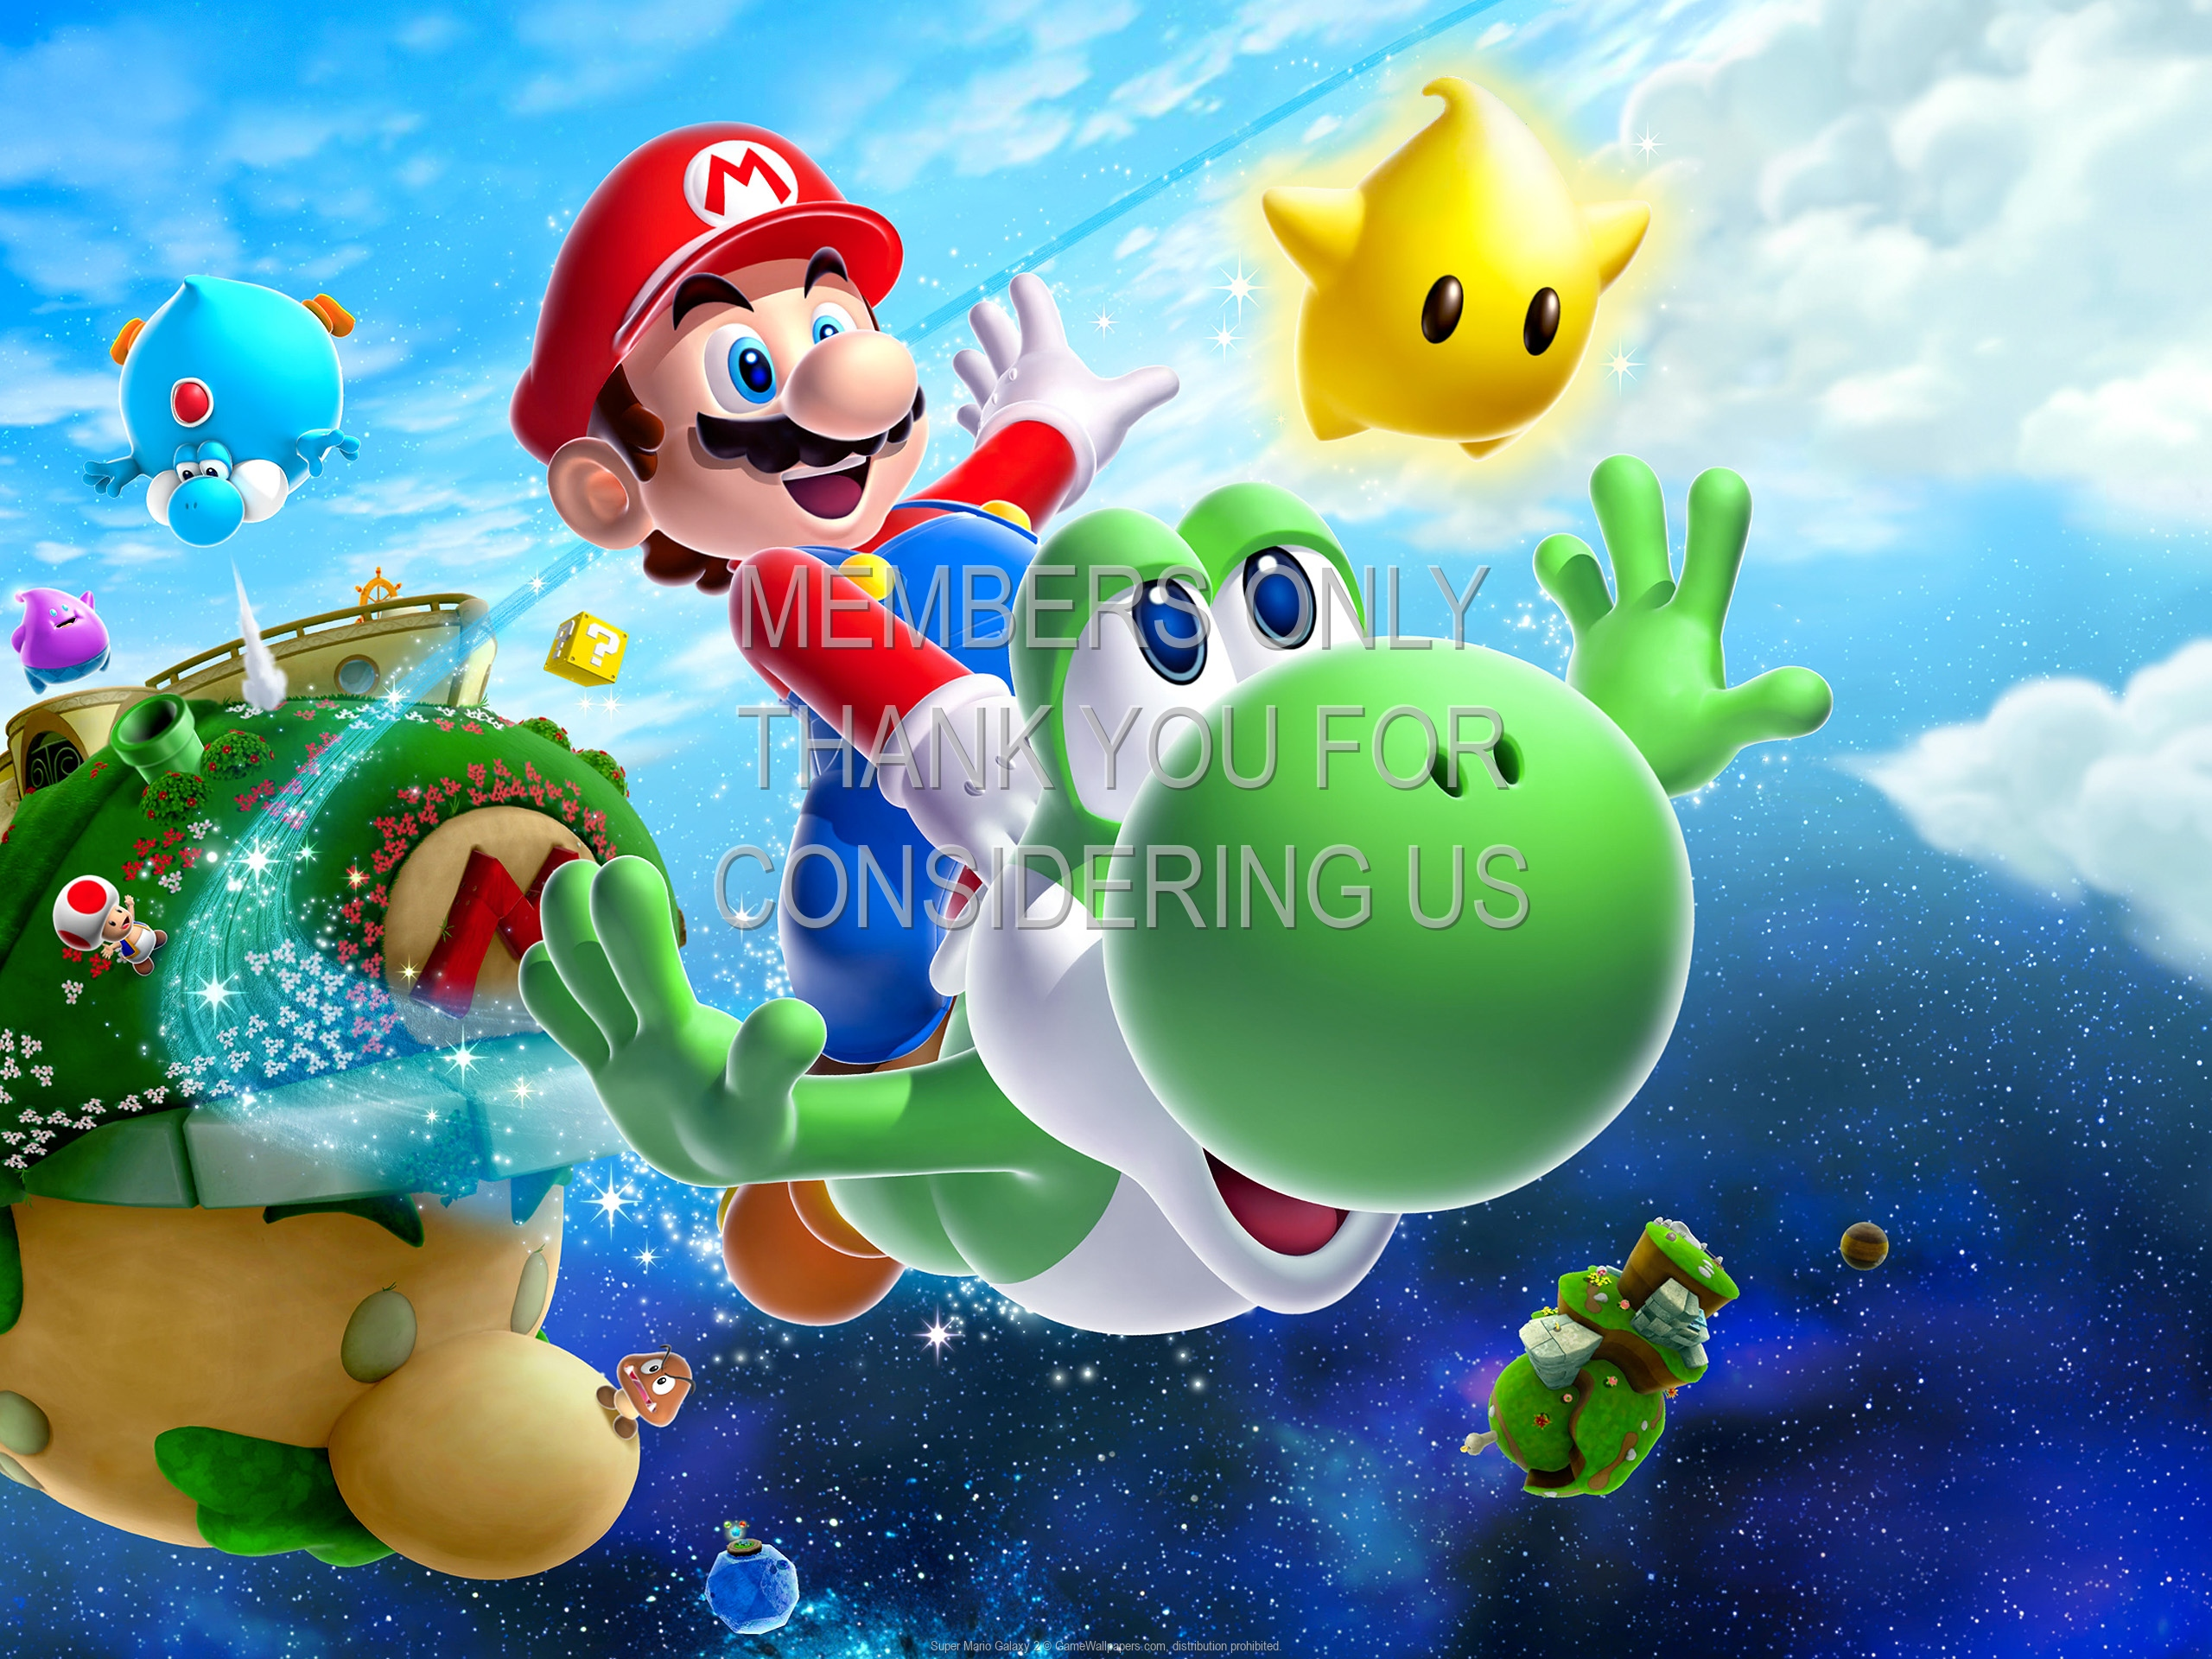 Super Mario Galaxy 2 1920x1080 Mobile wallpaper or background 01